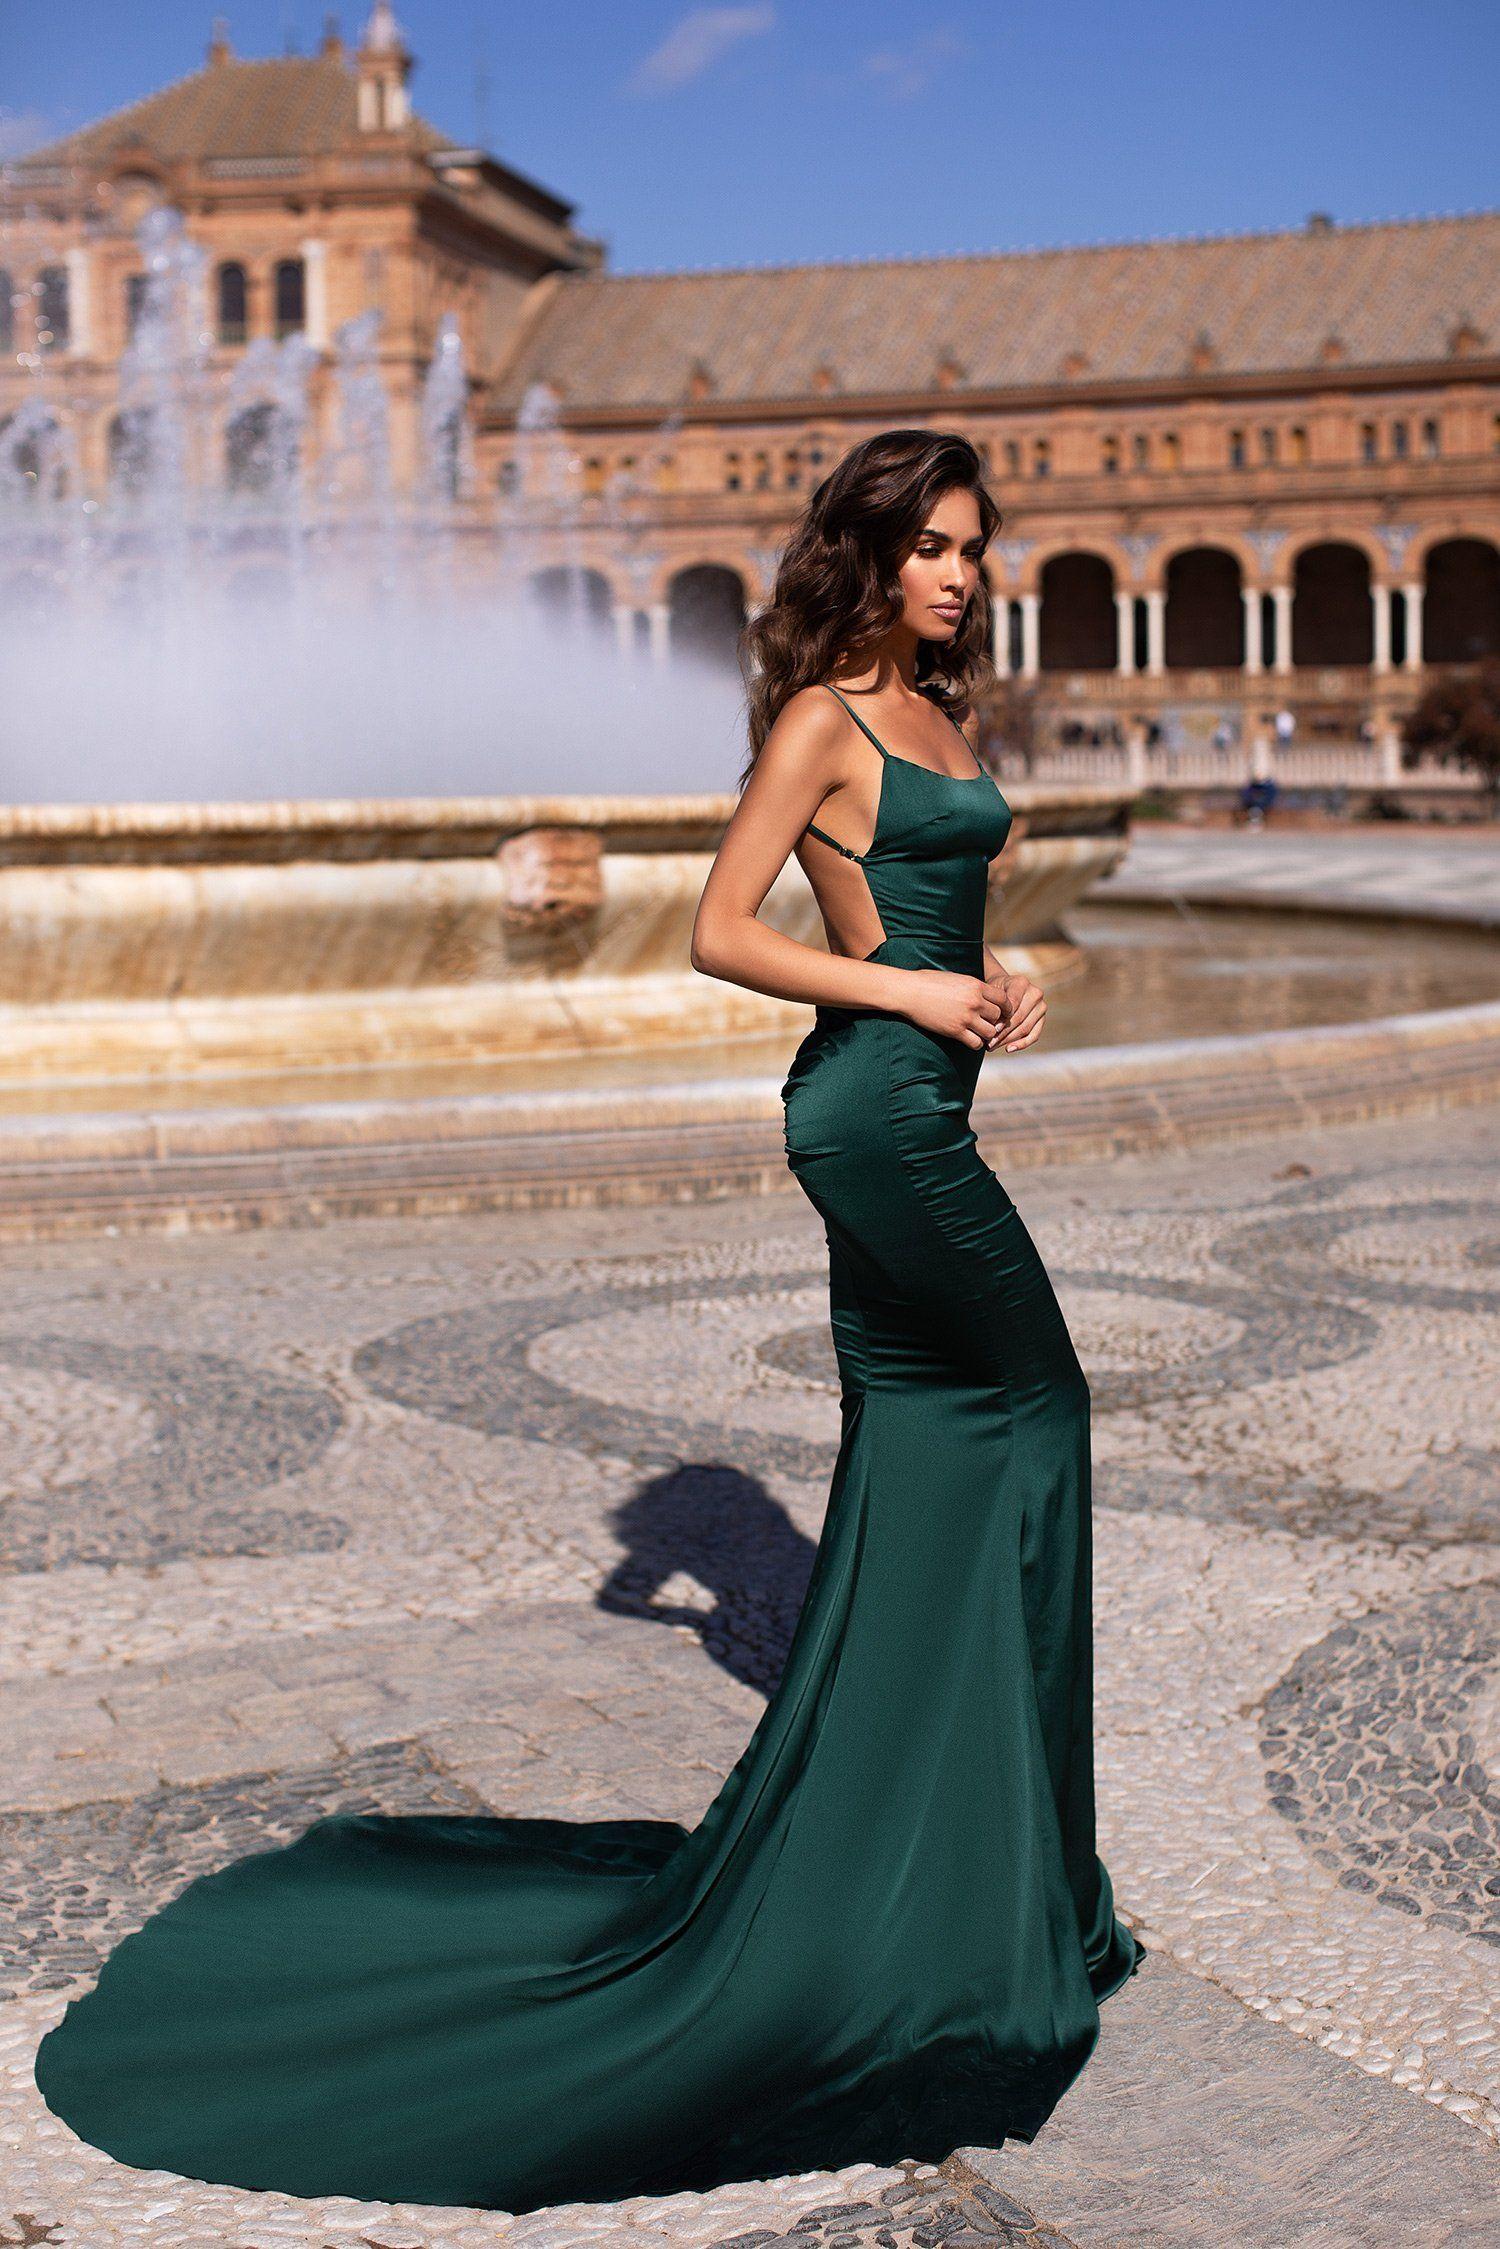 Delara Emerald Girls Formal Dresses Dresses Evening Gowns Formal [ 2249 x 1500 Pixel ]